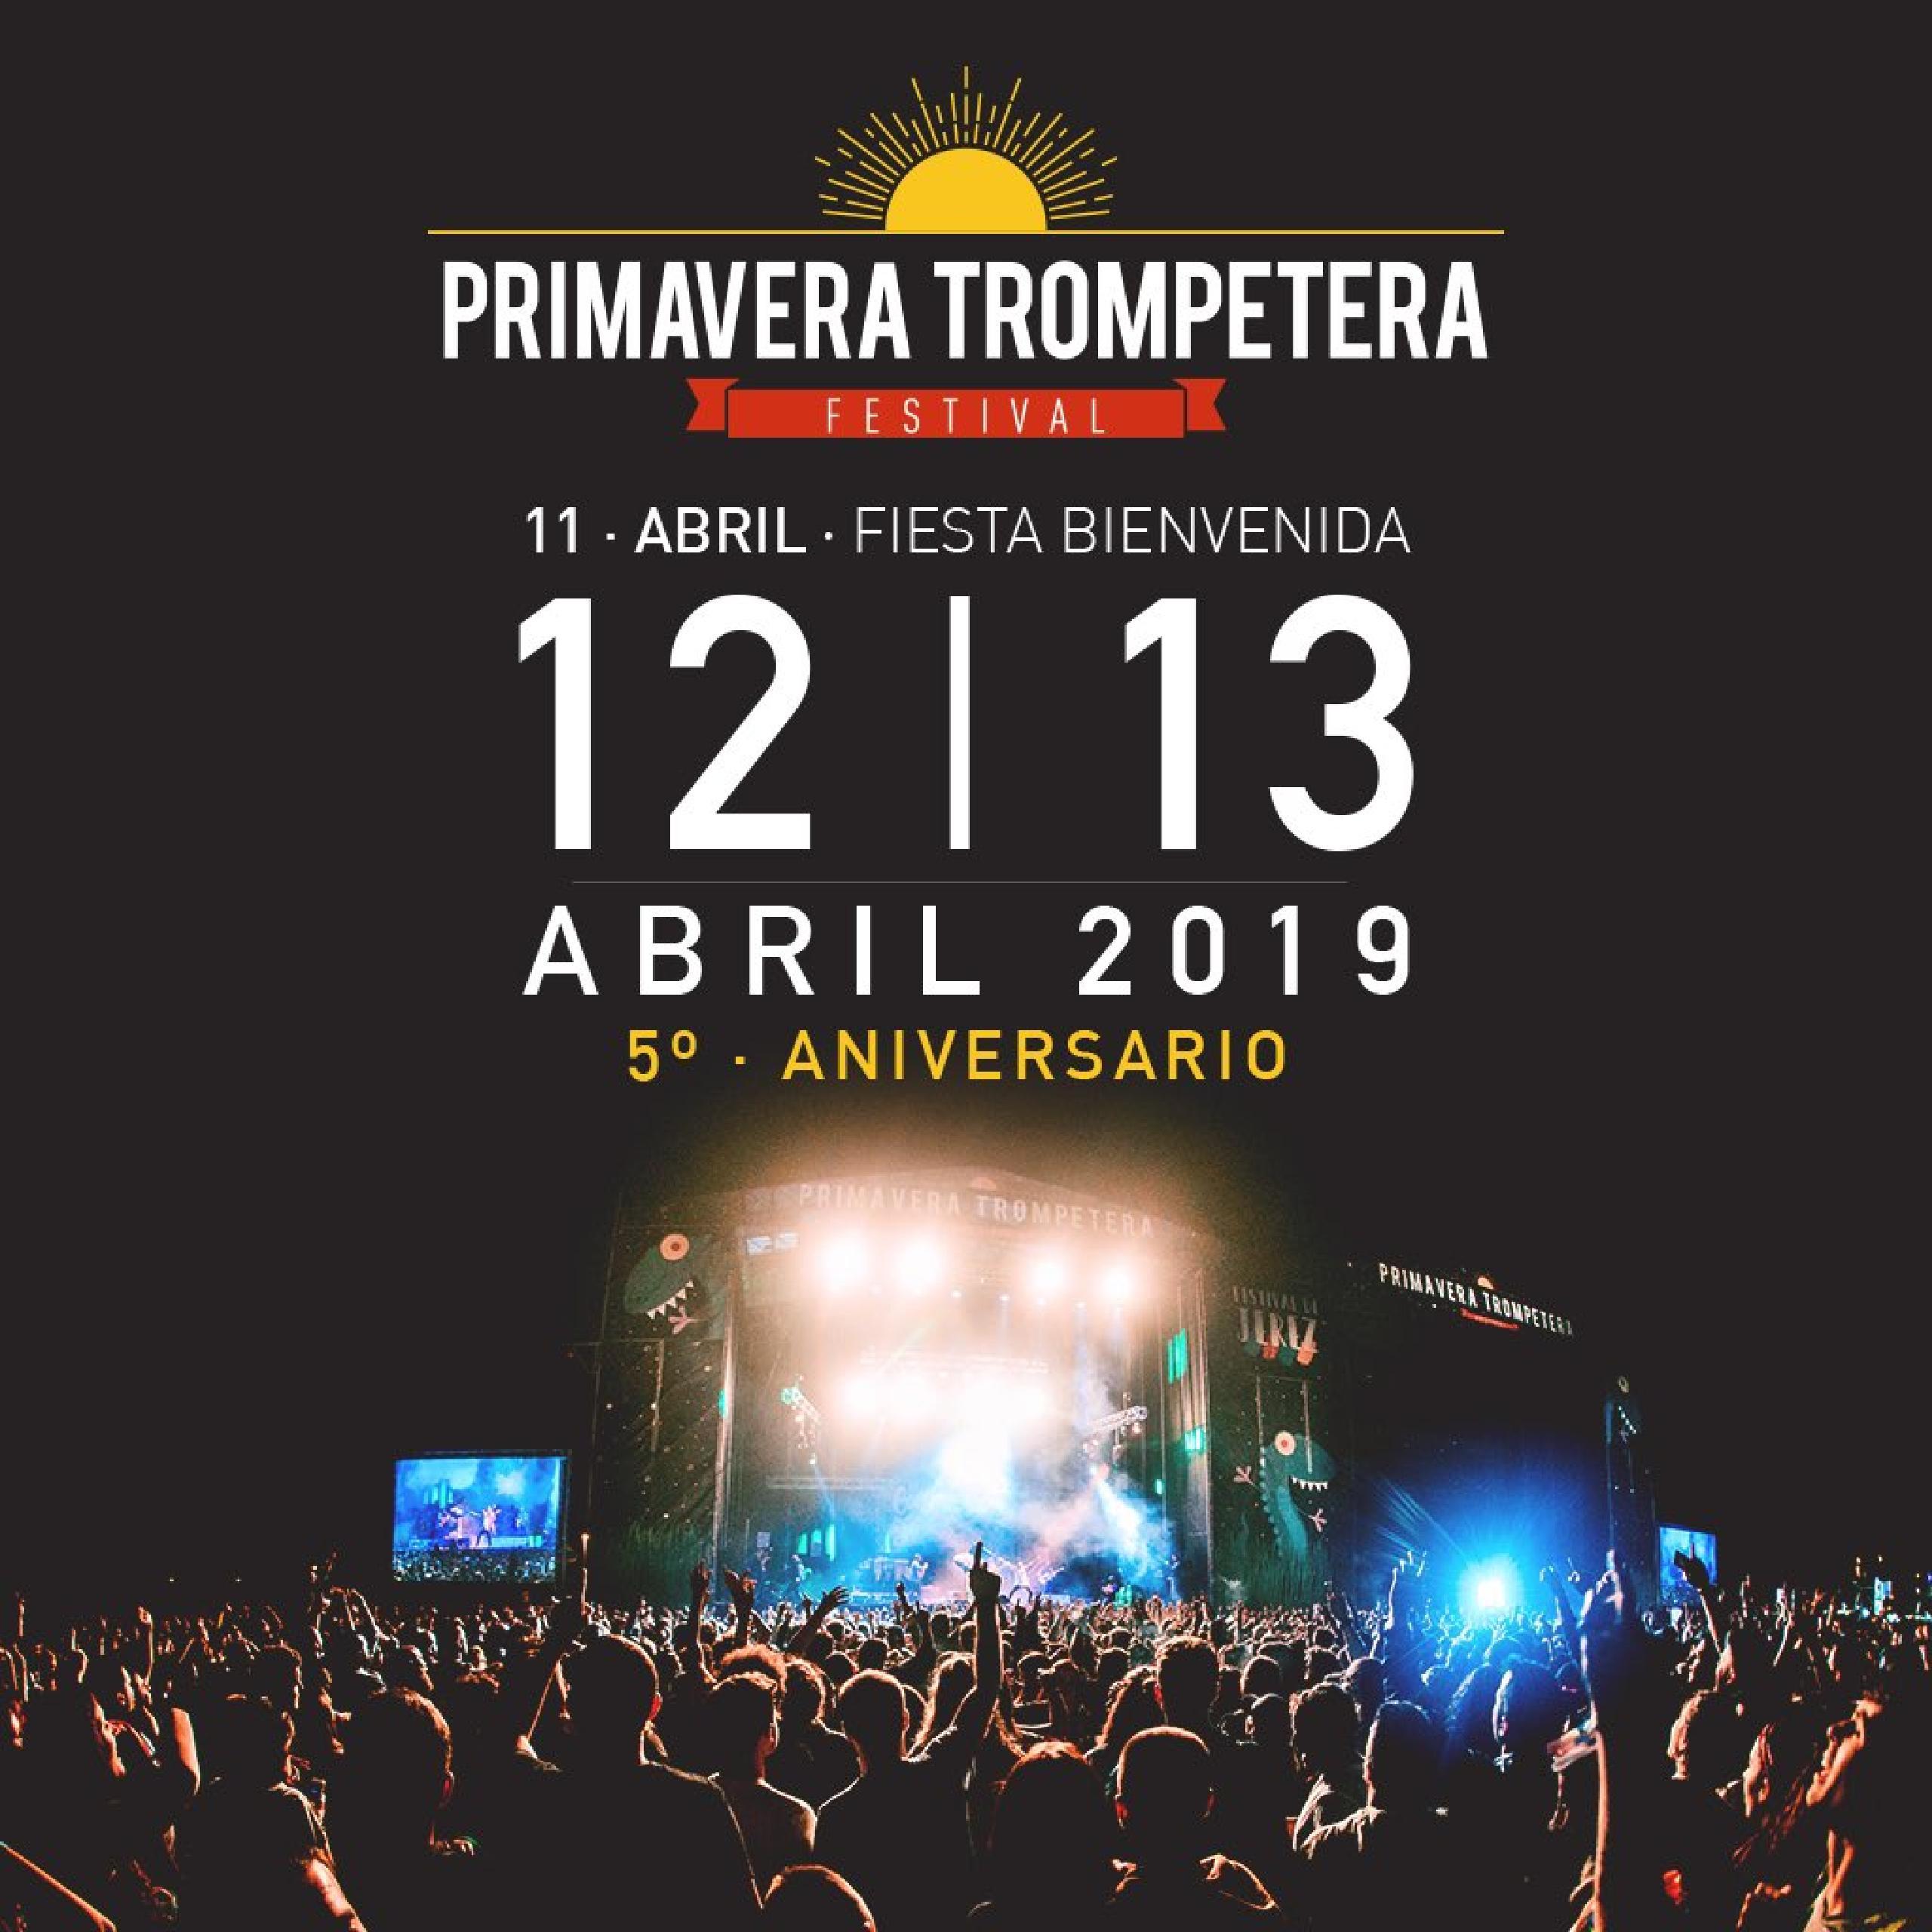 Foto de Primavera Trompetera 2019